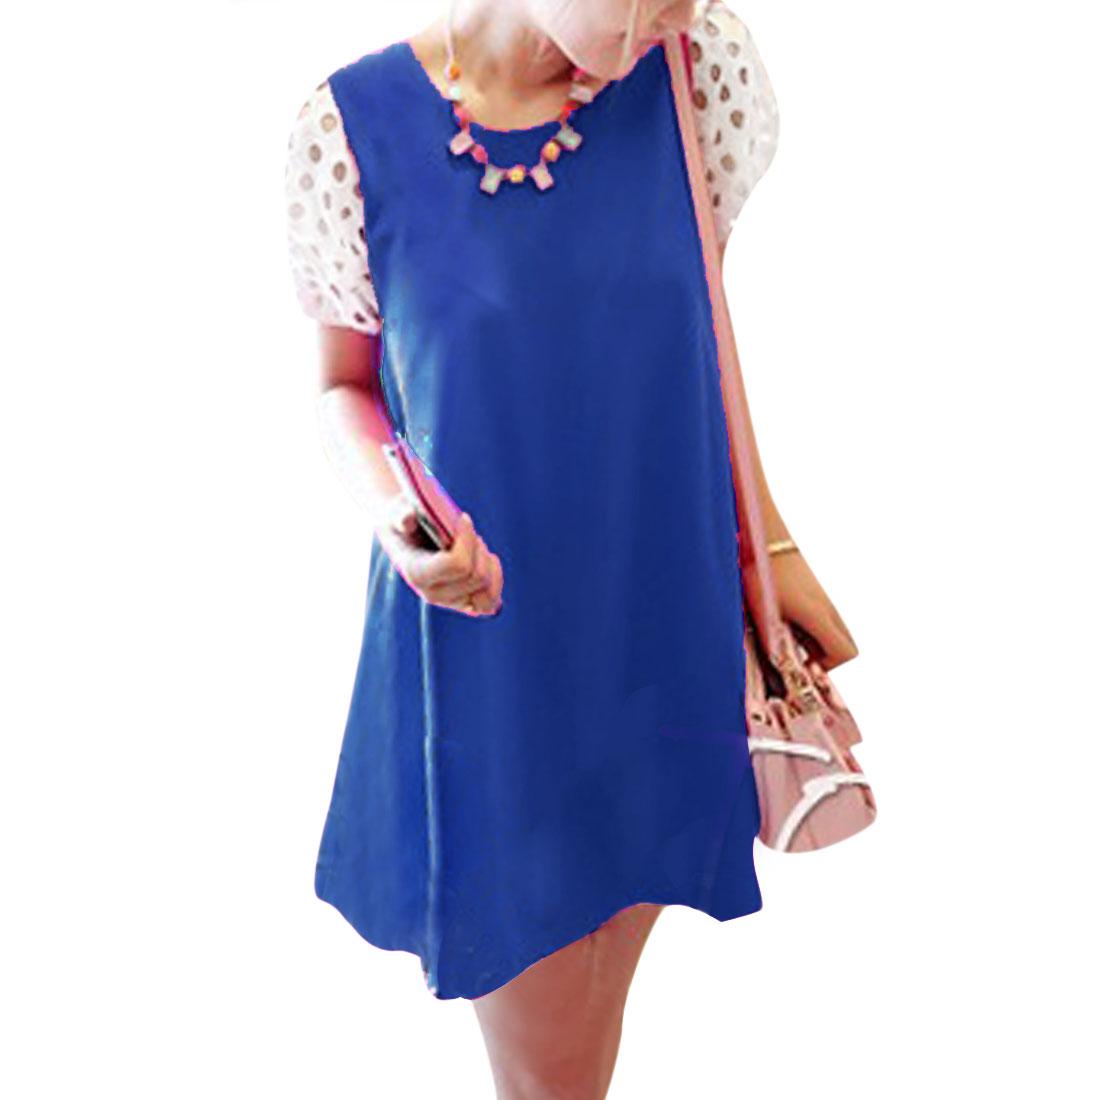 Ladies New Fashion Round Neck Cutout Short Puff Sleeve Royalblue Mini Dress XS